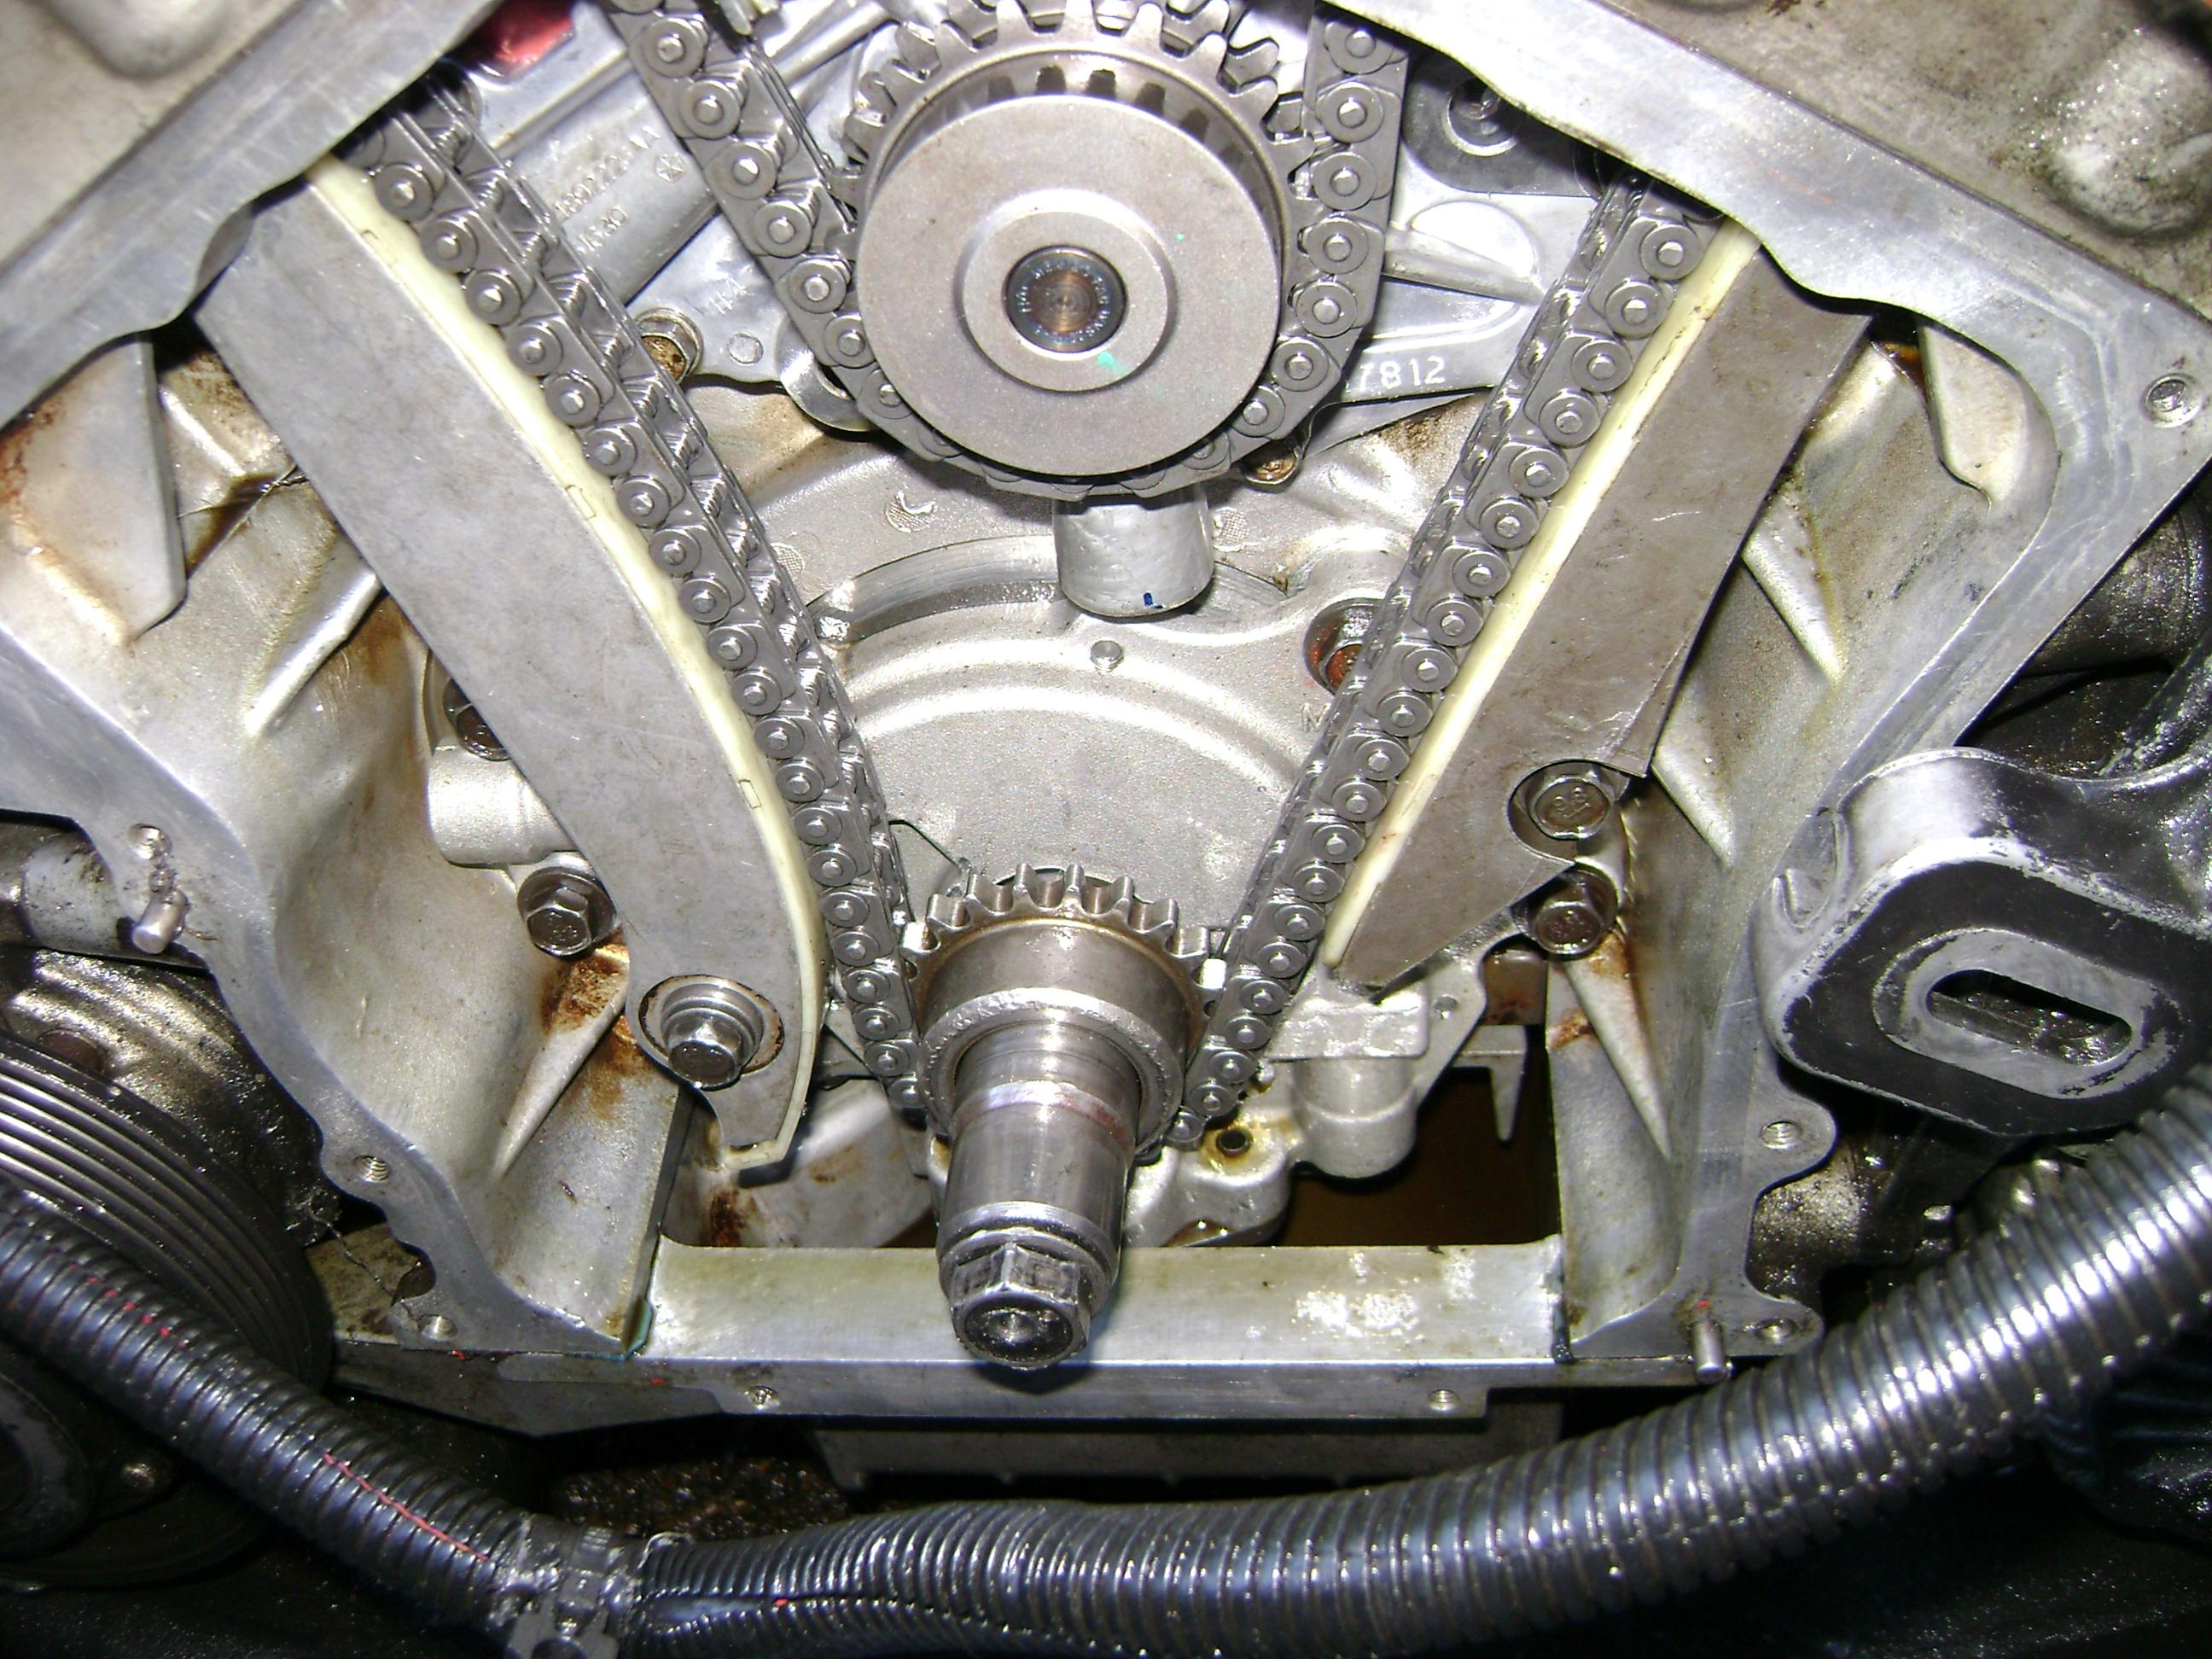 Hemi Engine Piston Diagram Wiring Will Be A Thing Dodge Belt 2004 Intrepid 2 7 Free 57 Stock 2007